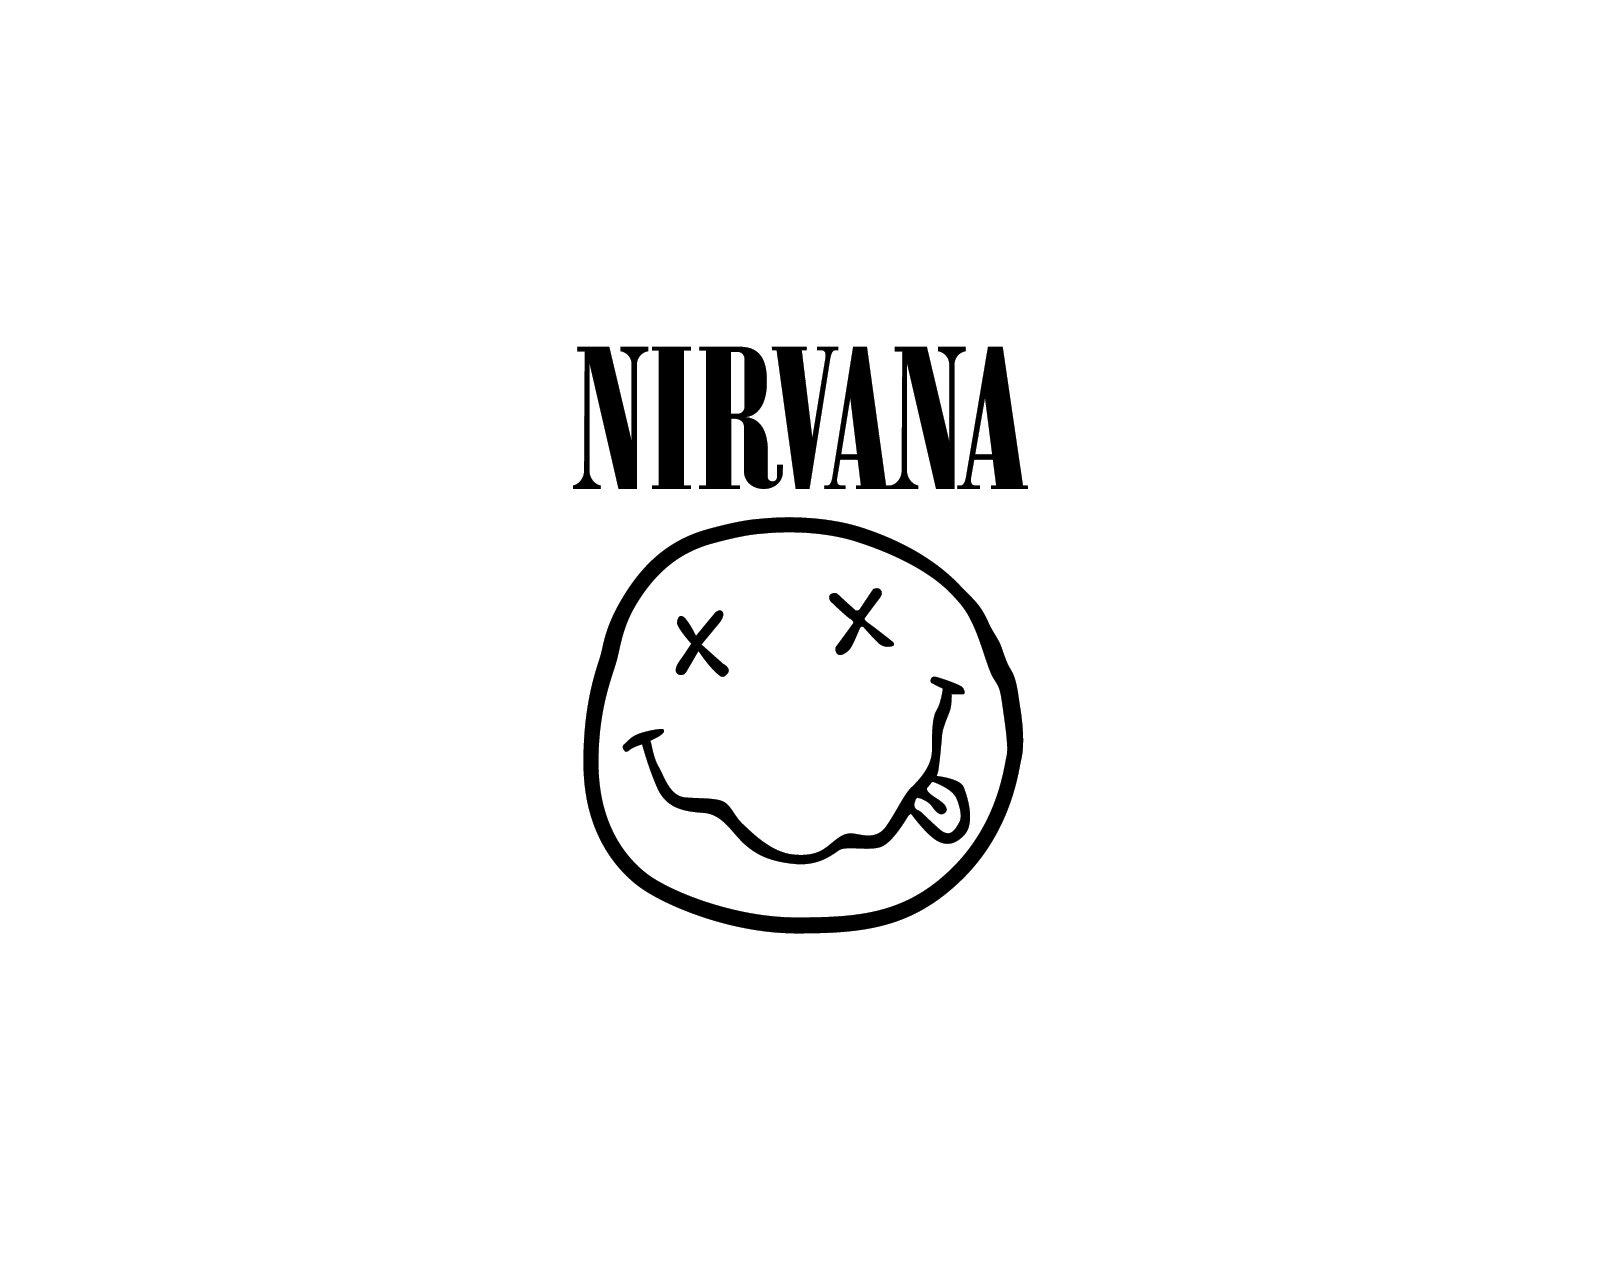 Amazing Wallpaper Logo Nirvana - thumb-1920-293753  Picture_995723.jpg